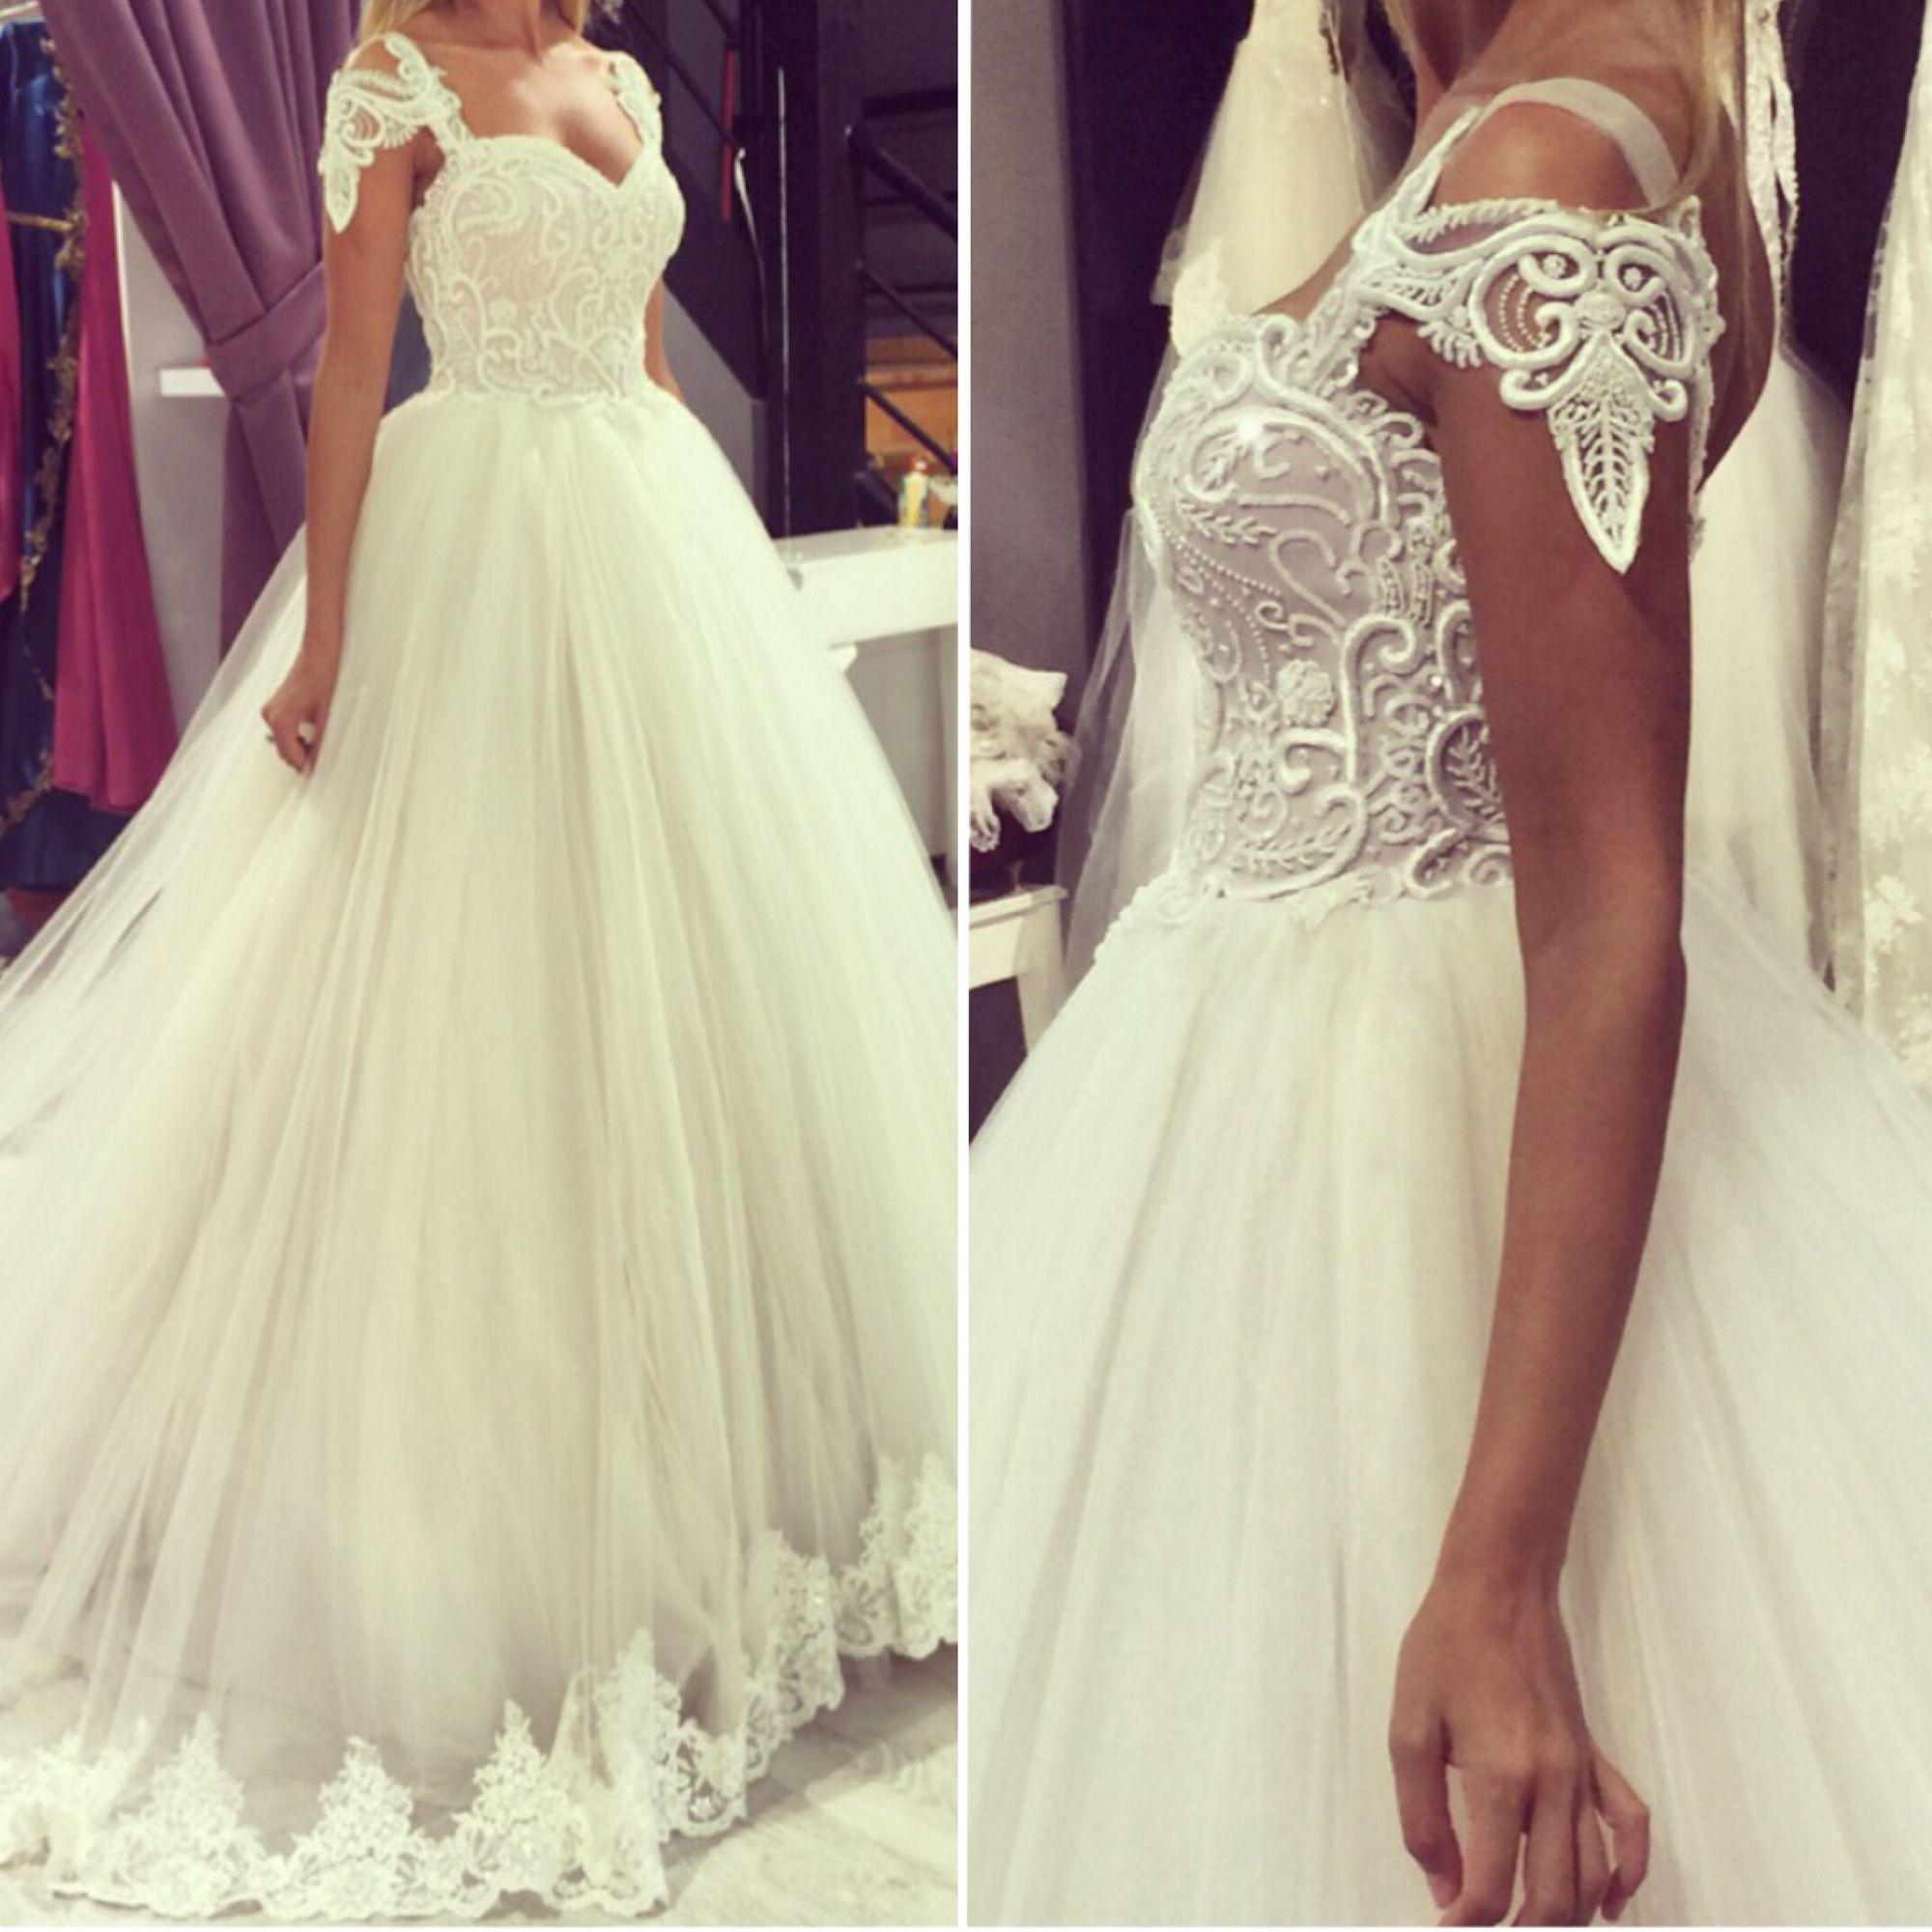 White House By Ozge Yilmaz Wedding Dresses Dresses Dream Wedding Dresses [ 2000 x 2000 Pixel ]